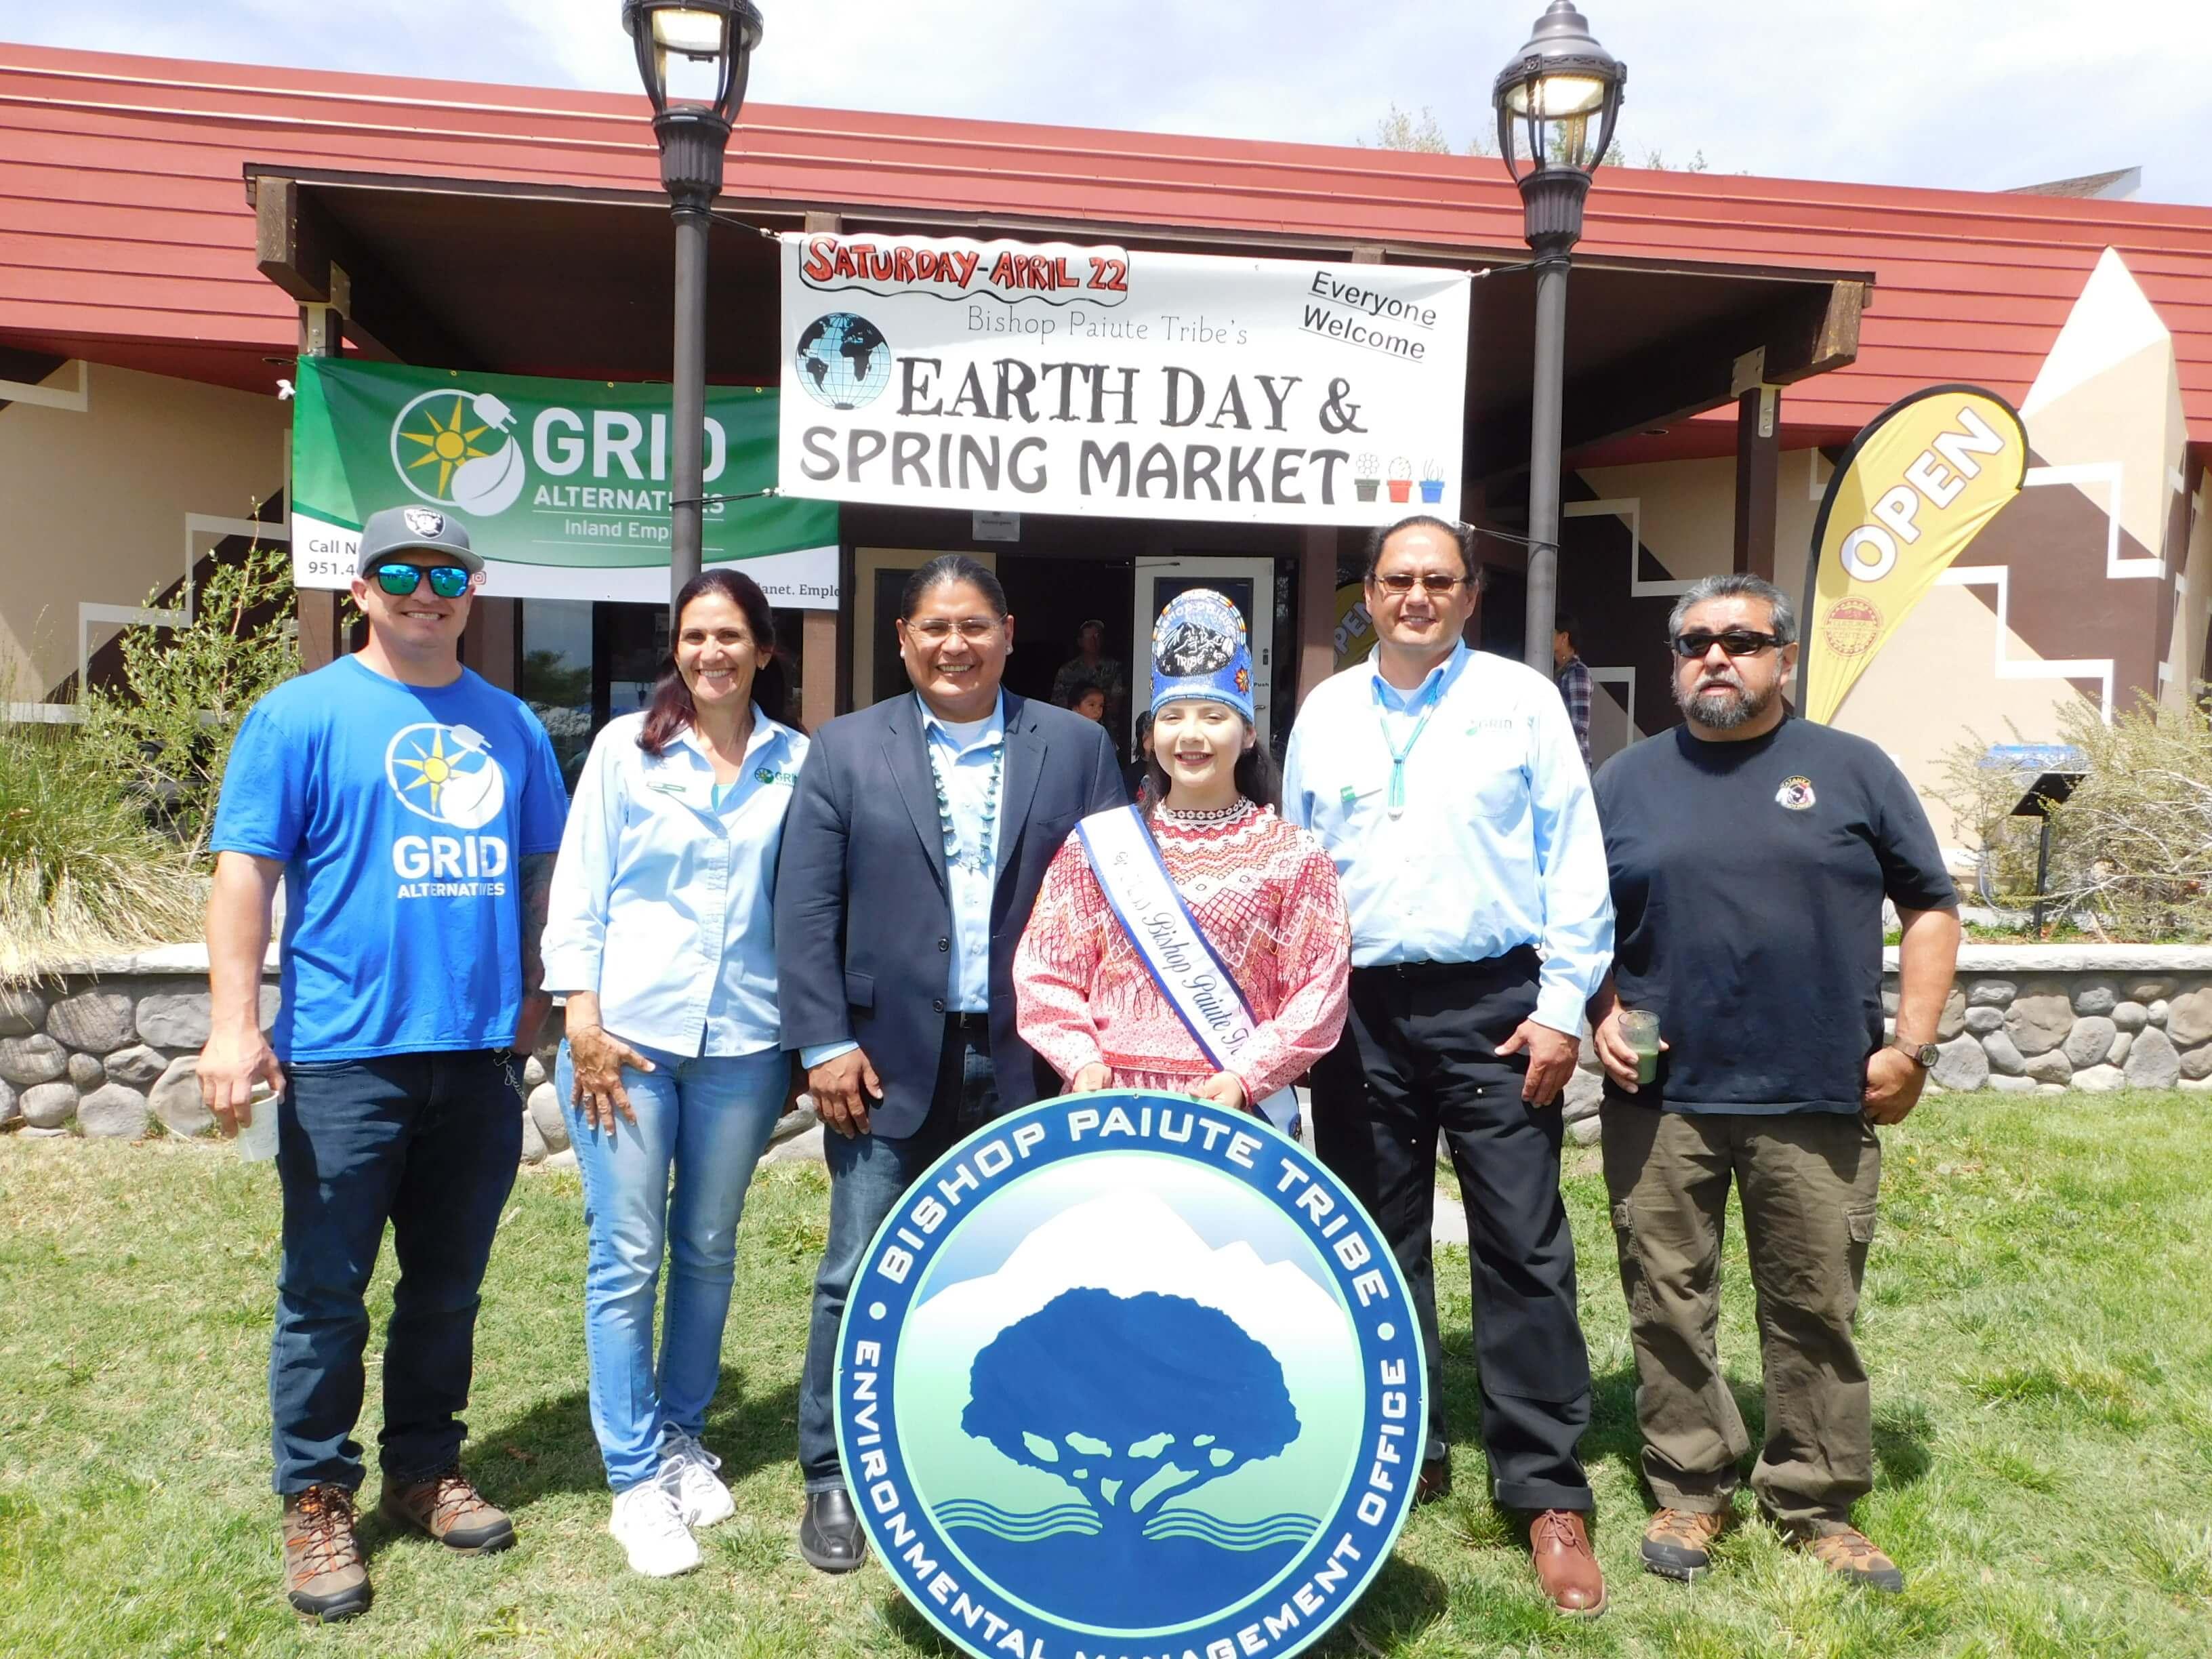 GRID DOE, GRID Complete 56 California Tribal Solar Installations